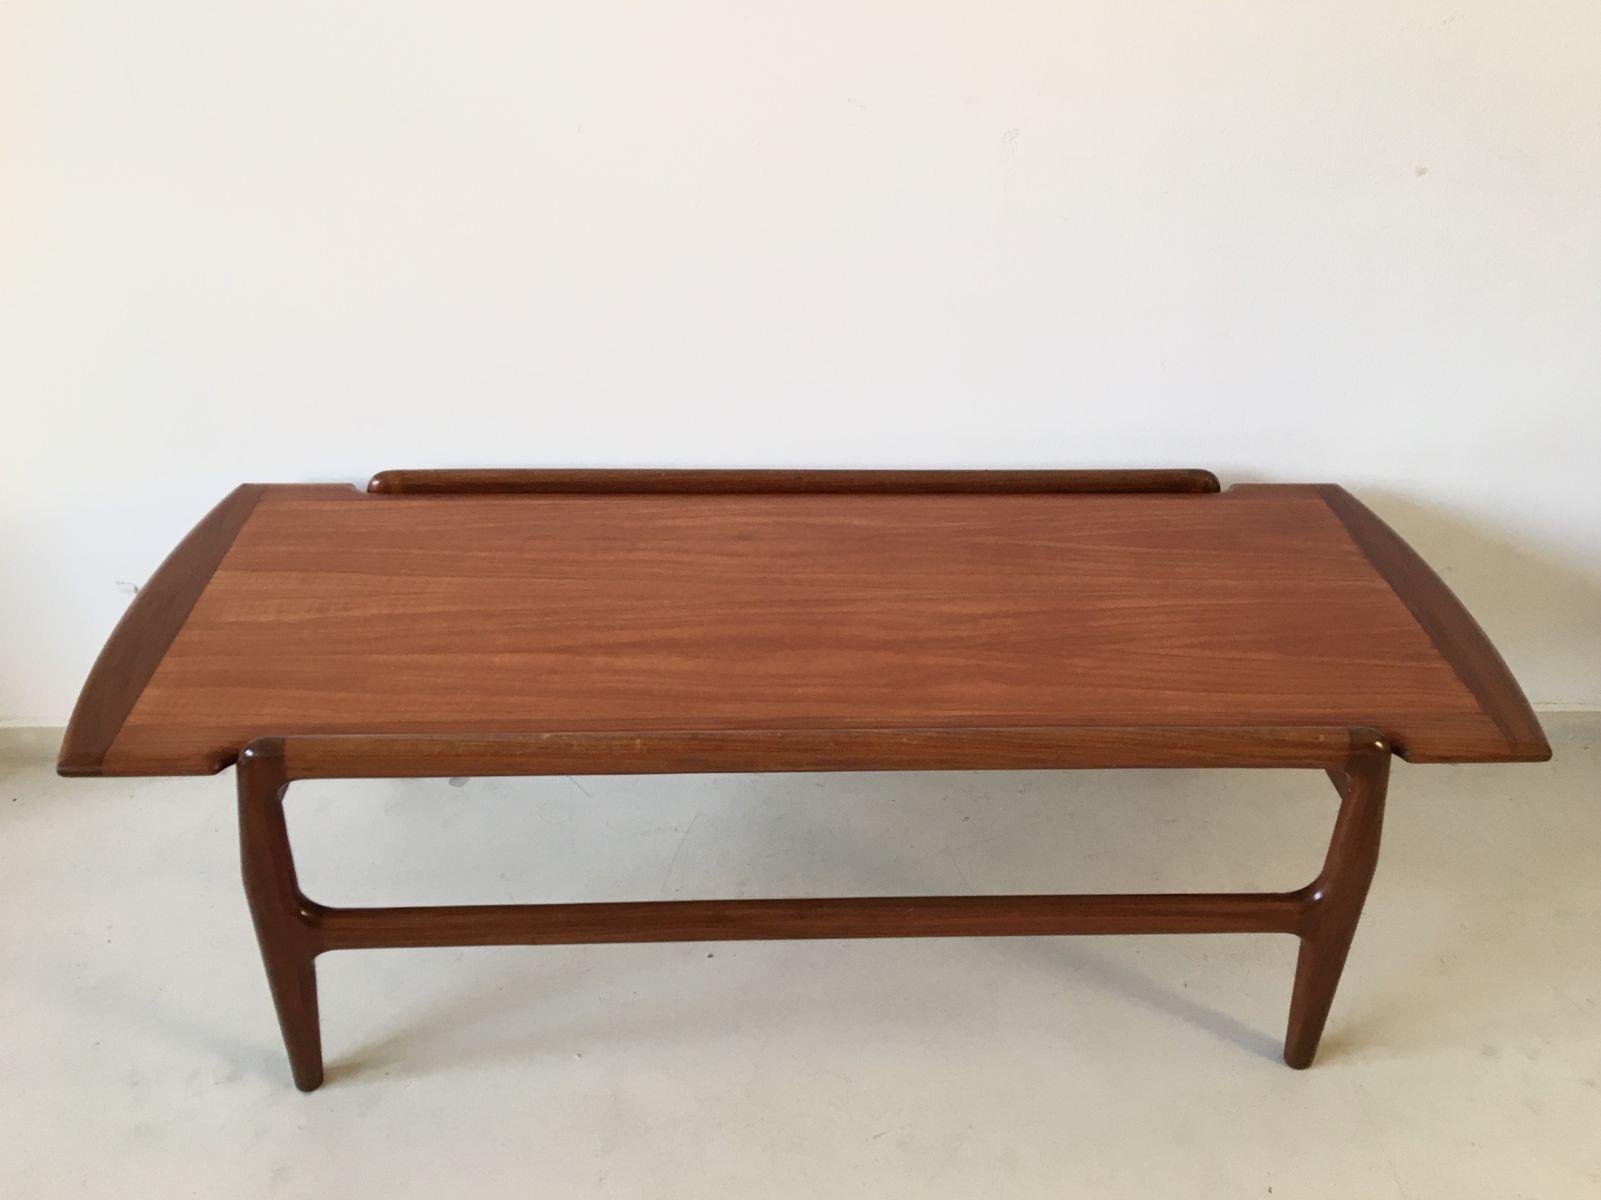 Reversible Danish Teak Coffee Table 1950s For Sale At Pamono